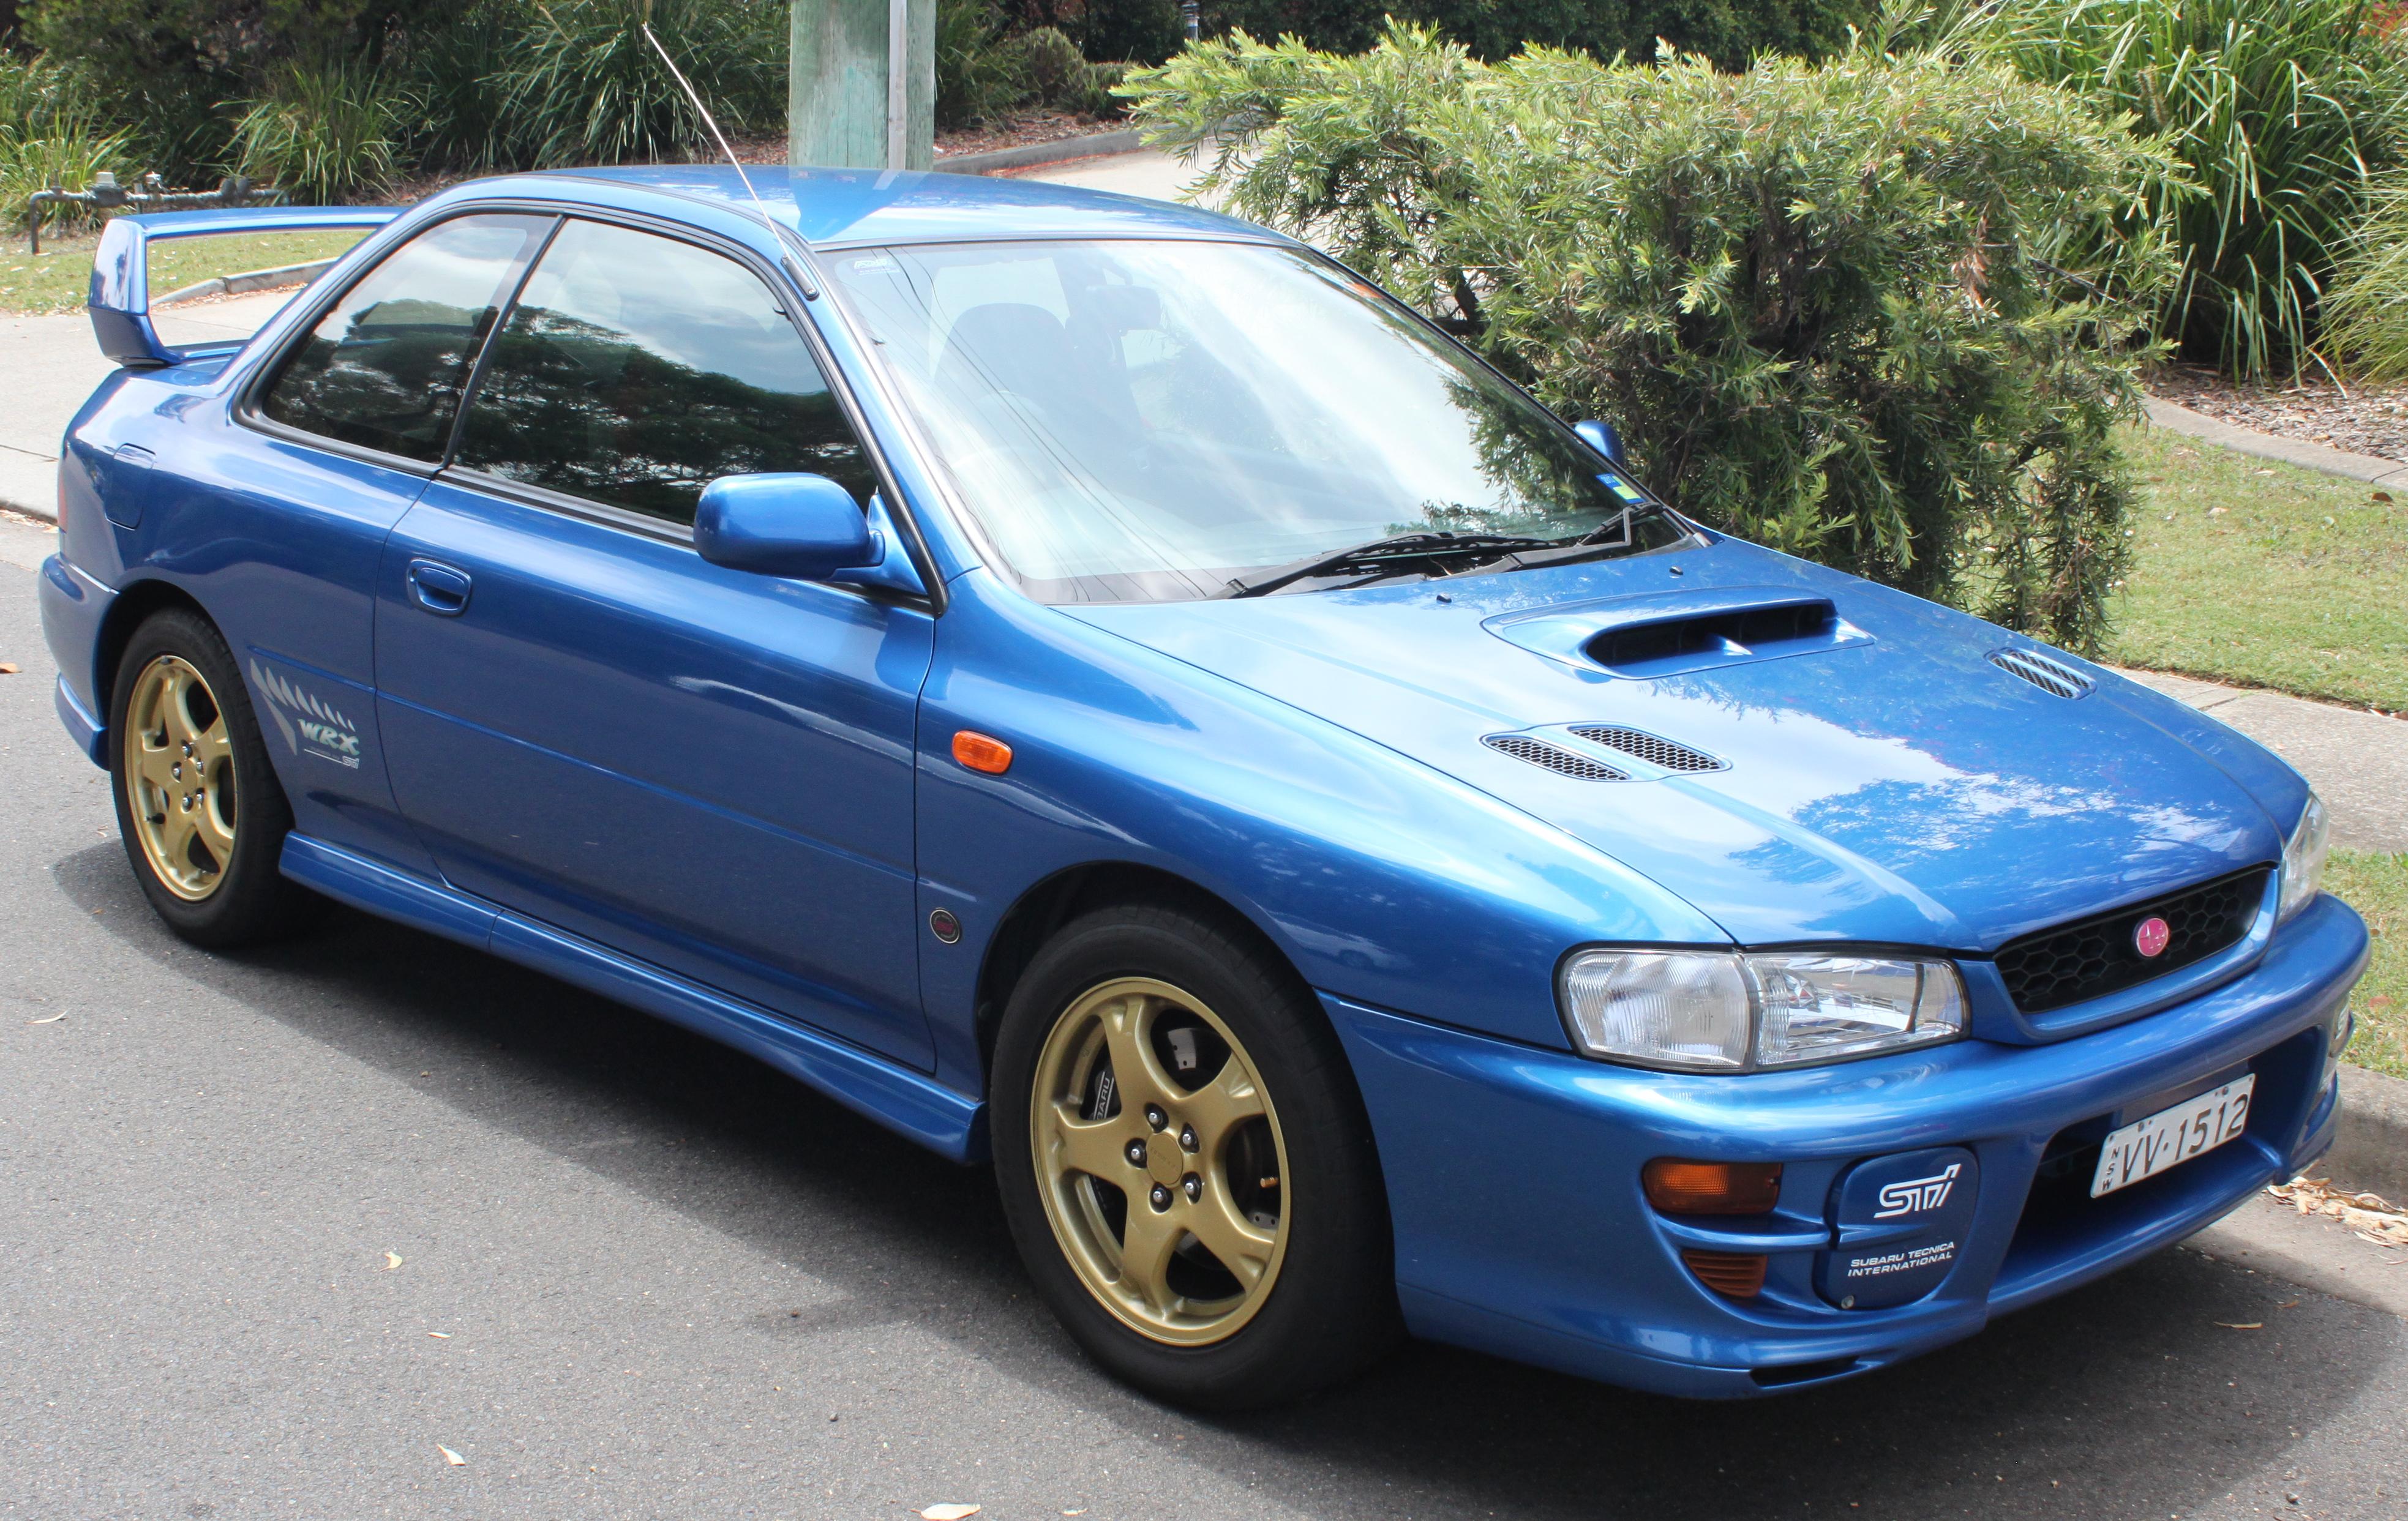 file:1999 subaru impreza (my99) wrx sti version 5 coupe